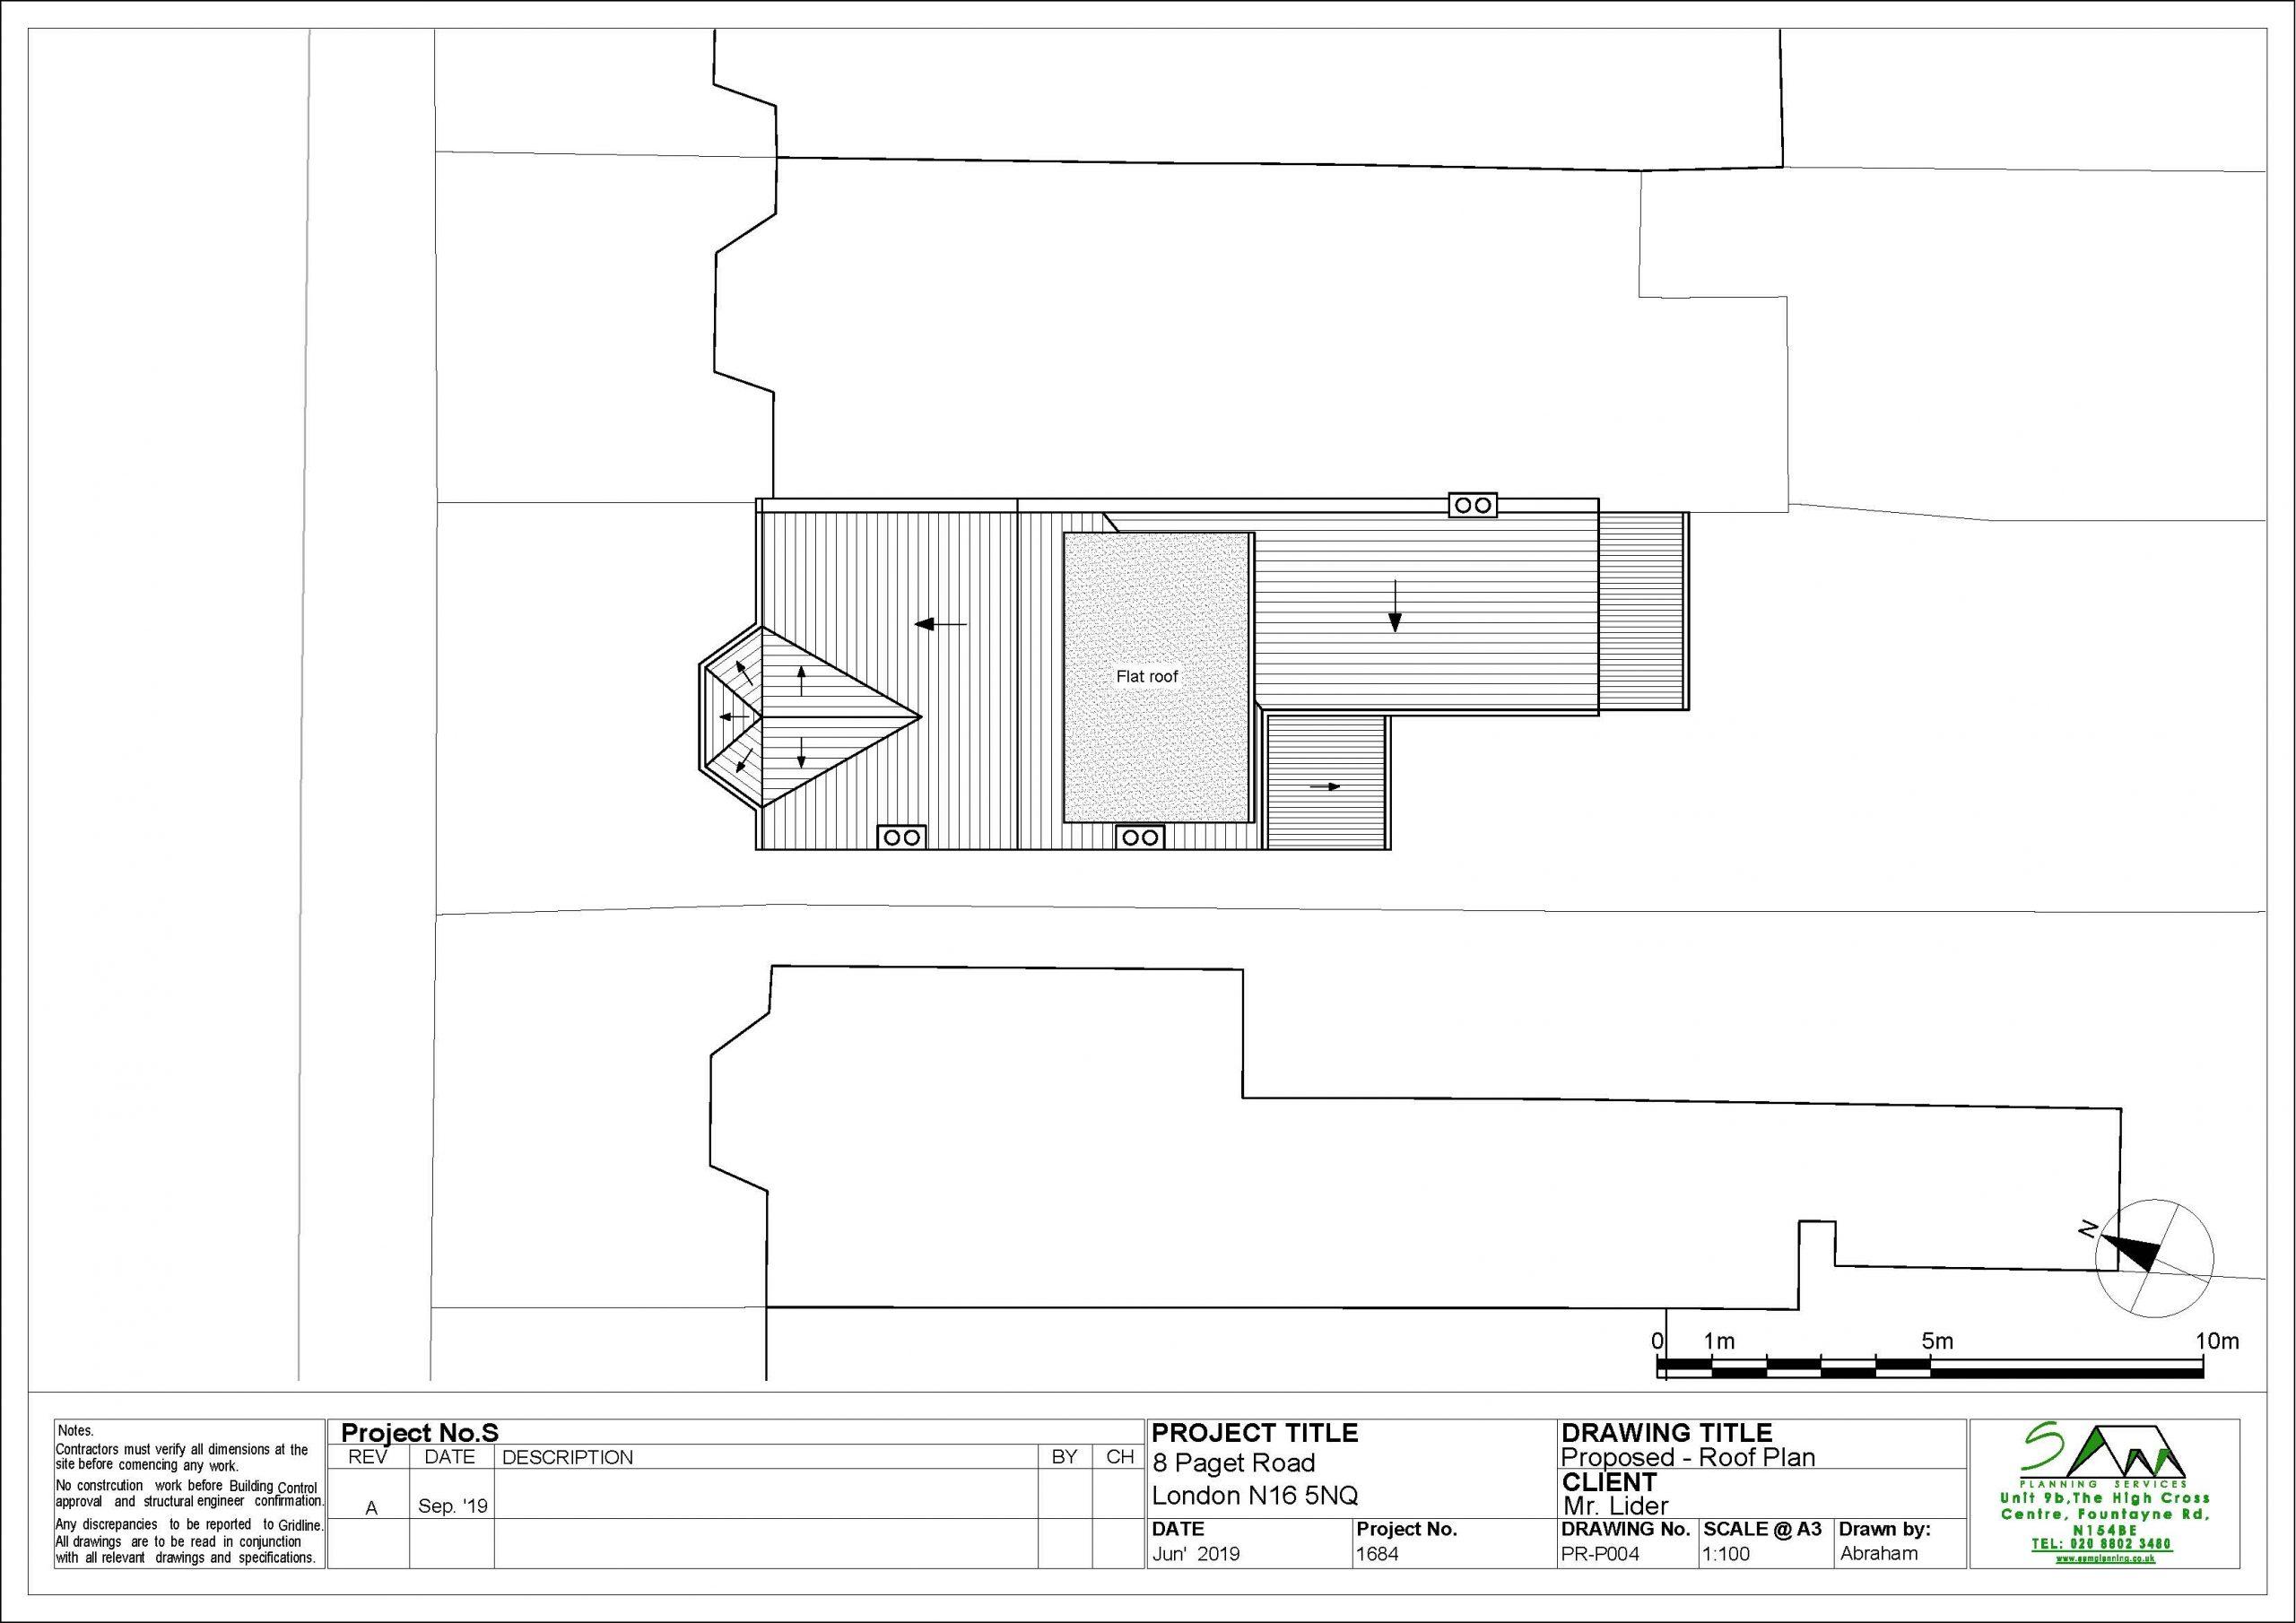 8pagetProposed Roof plan rev A